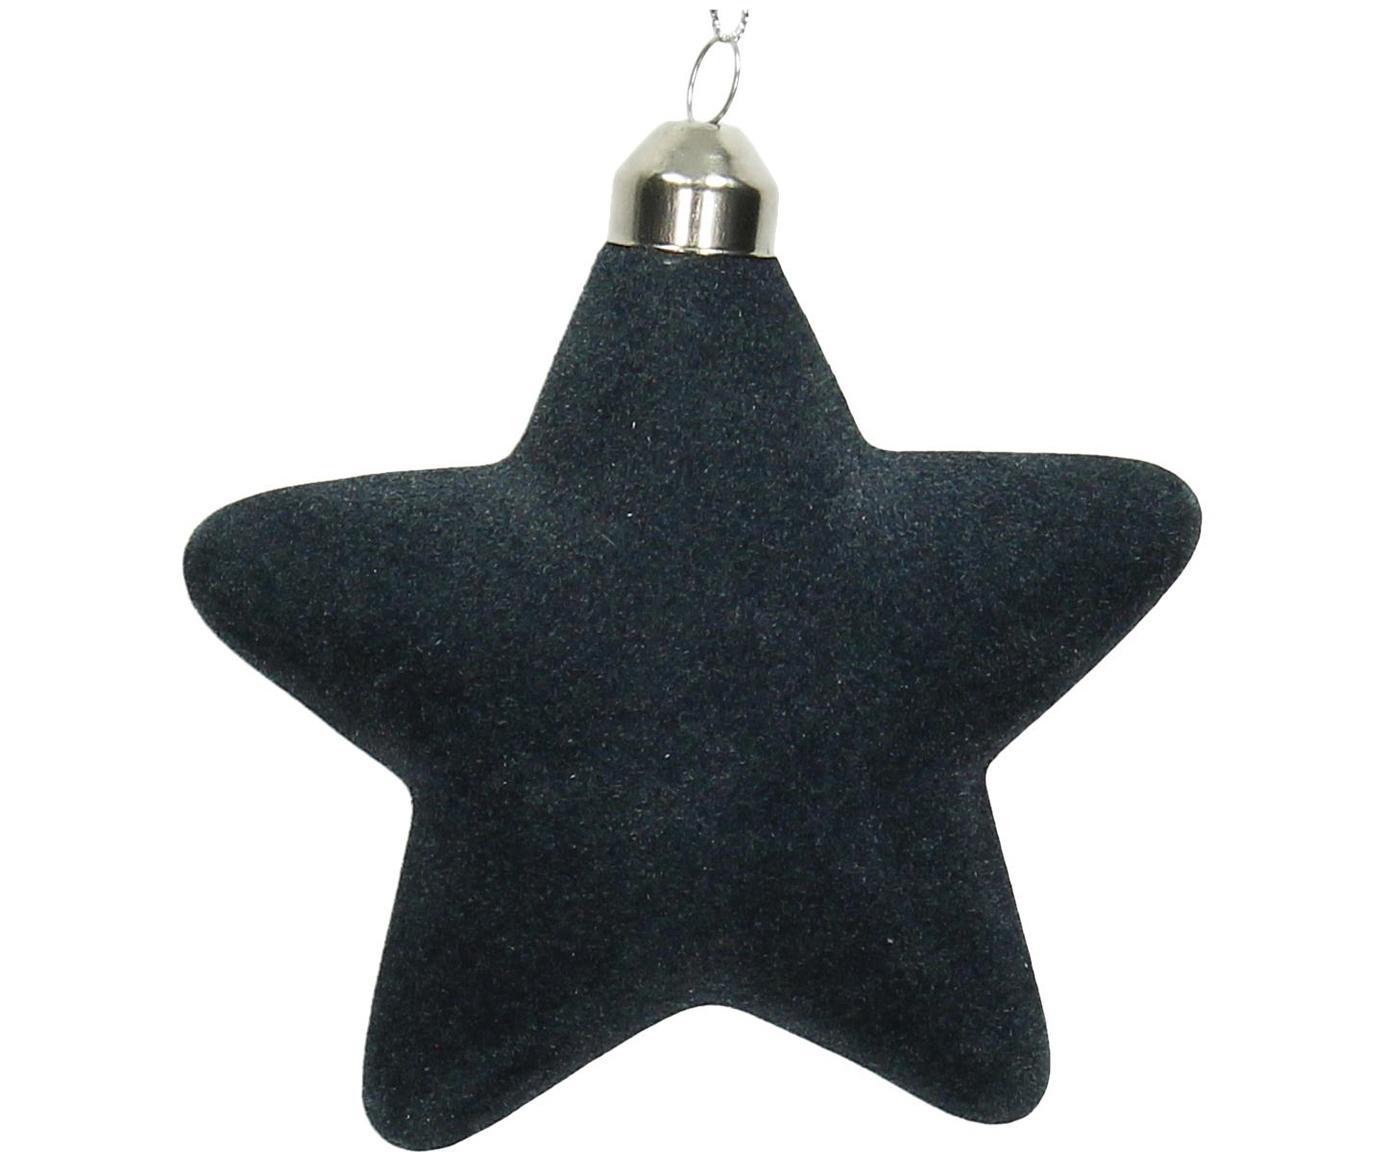 Kerstboomhangers Star, 4 stuks, Donkerblauw, 10 x 10 cm